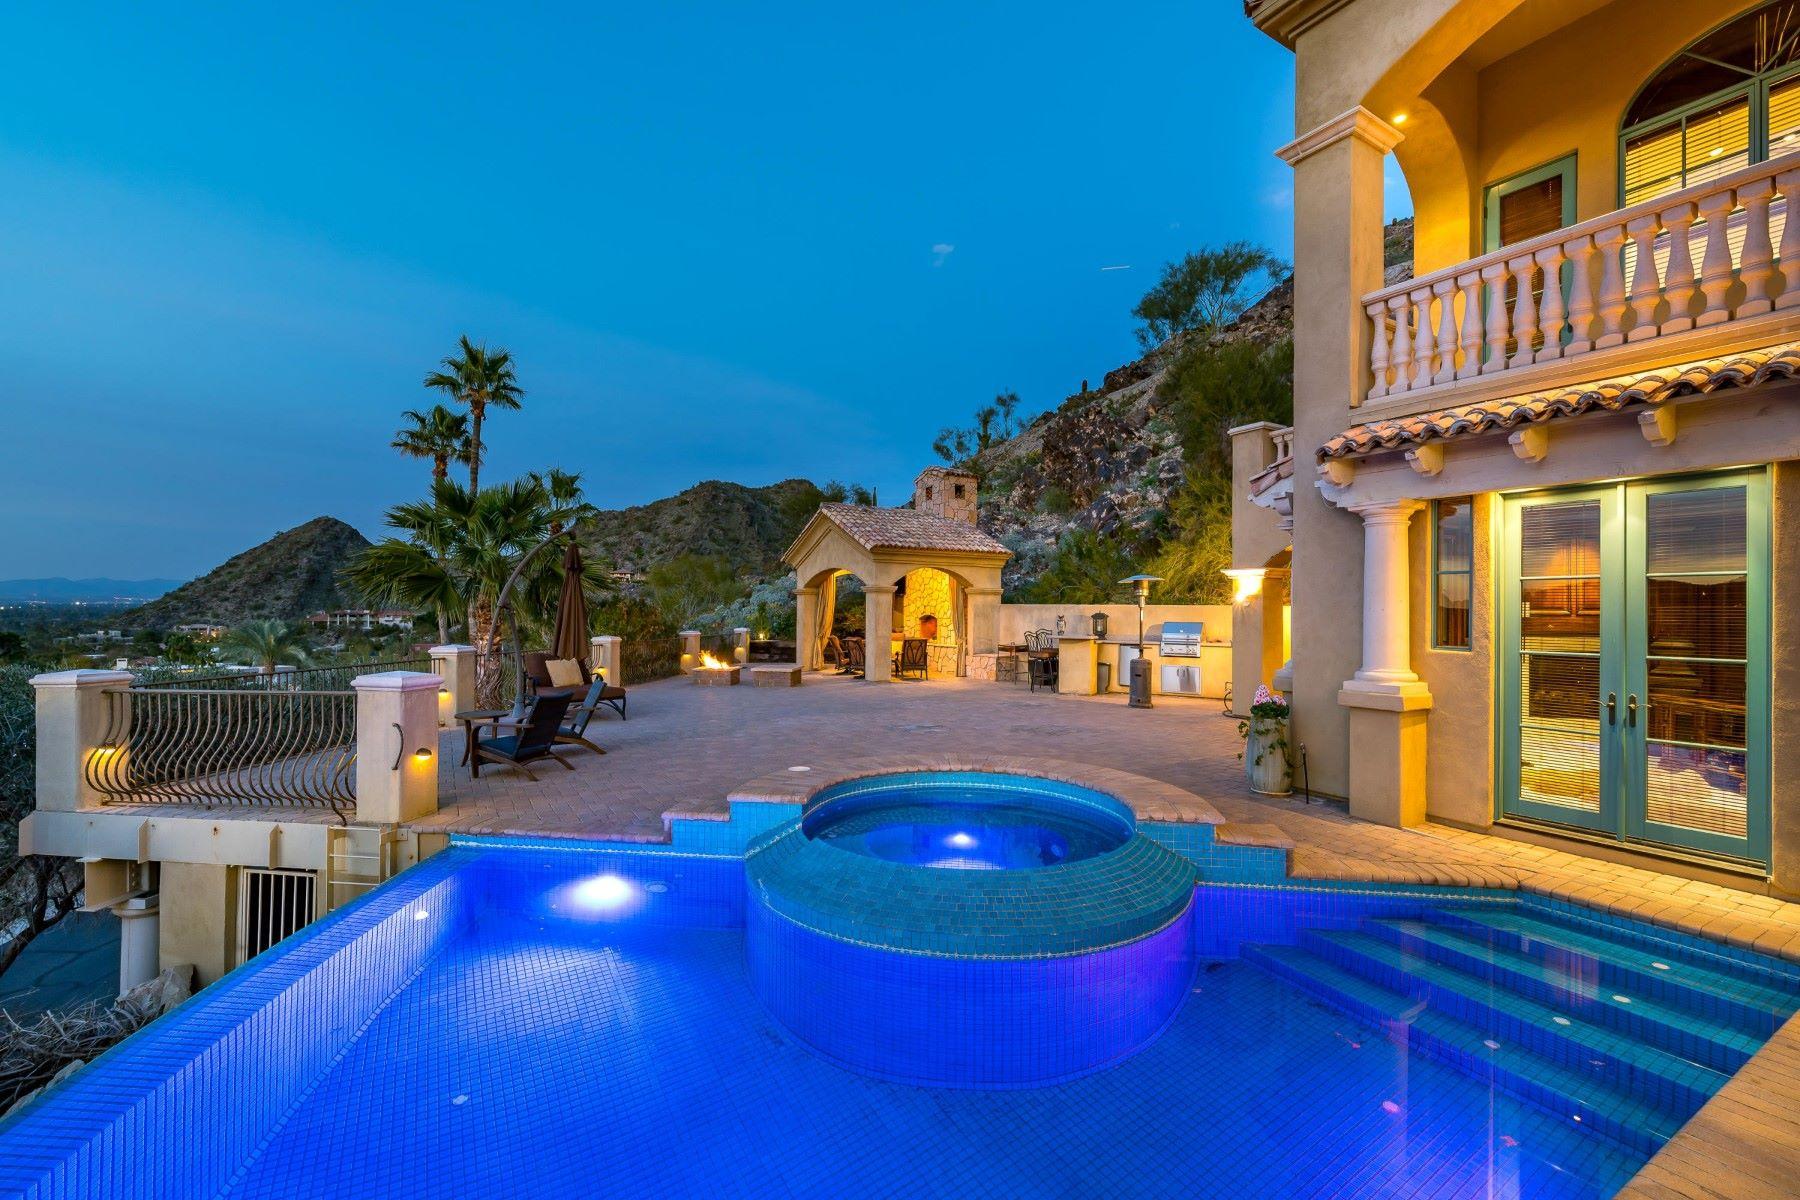 Additional photo for property listing at Paradise Canyon Foothills 5317 E Desert Vista Rd Paradise Valley, Arizona 85253 Estados Unidos